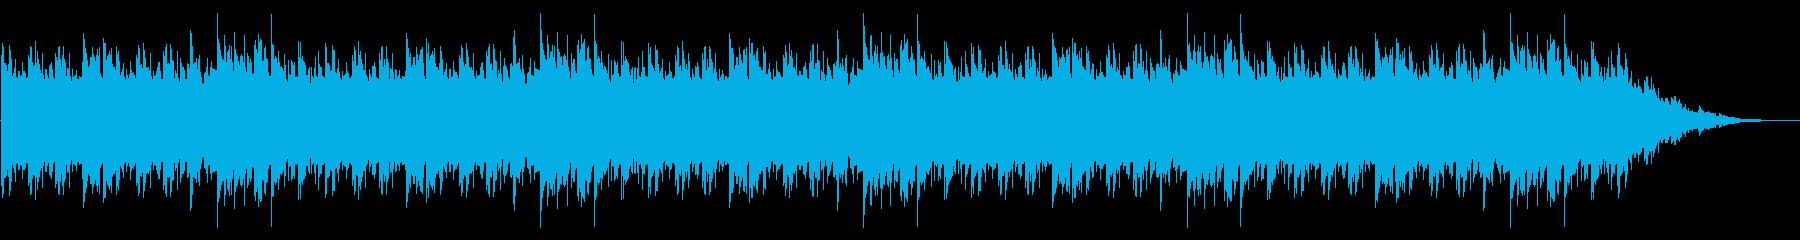 GB風RPGの通常戦闘曲の再生済みの波形